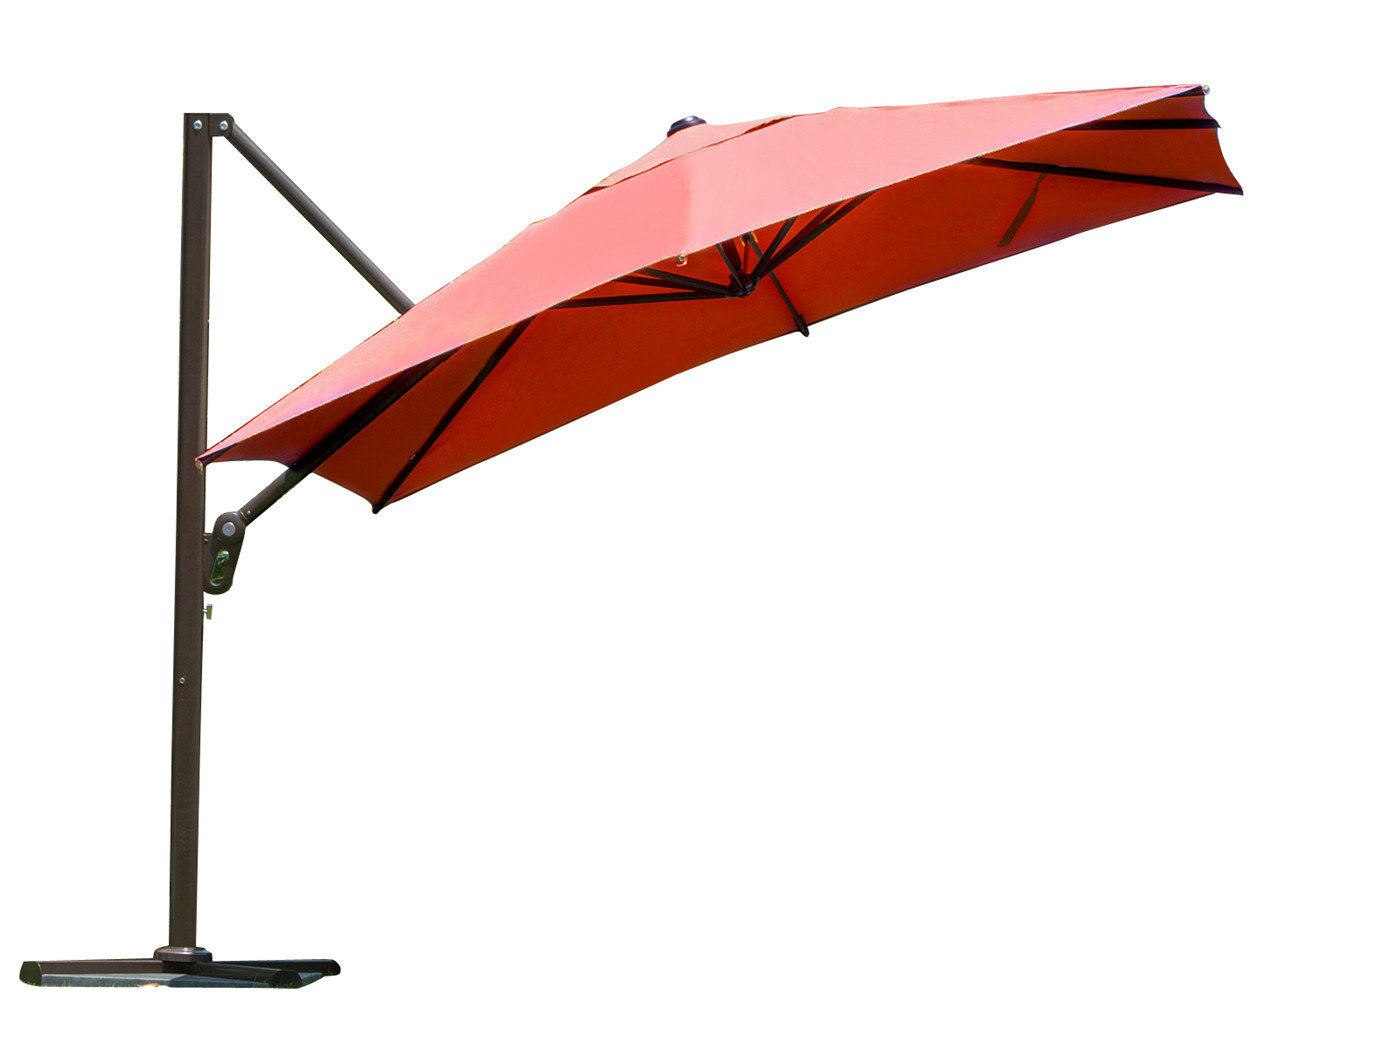 9' Square Cantilever Umbrella With Regard To Widely Used Maidste Square Cantilever Umbrellas (Gallery 10 of 20)